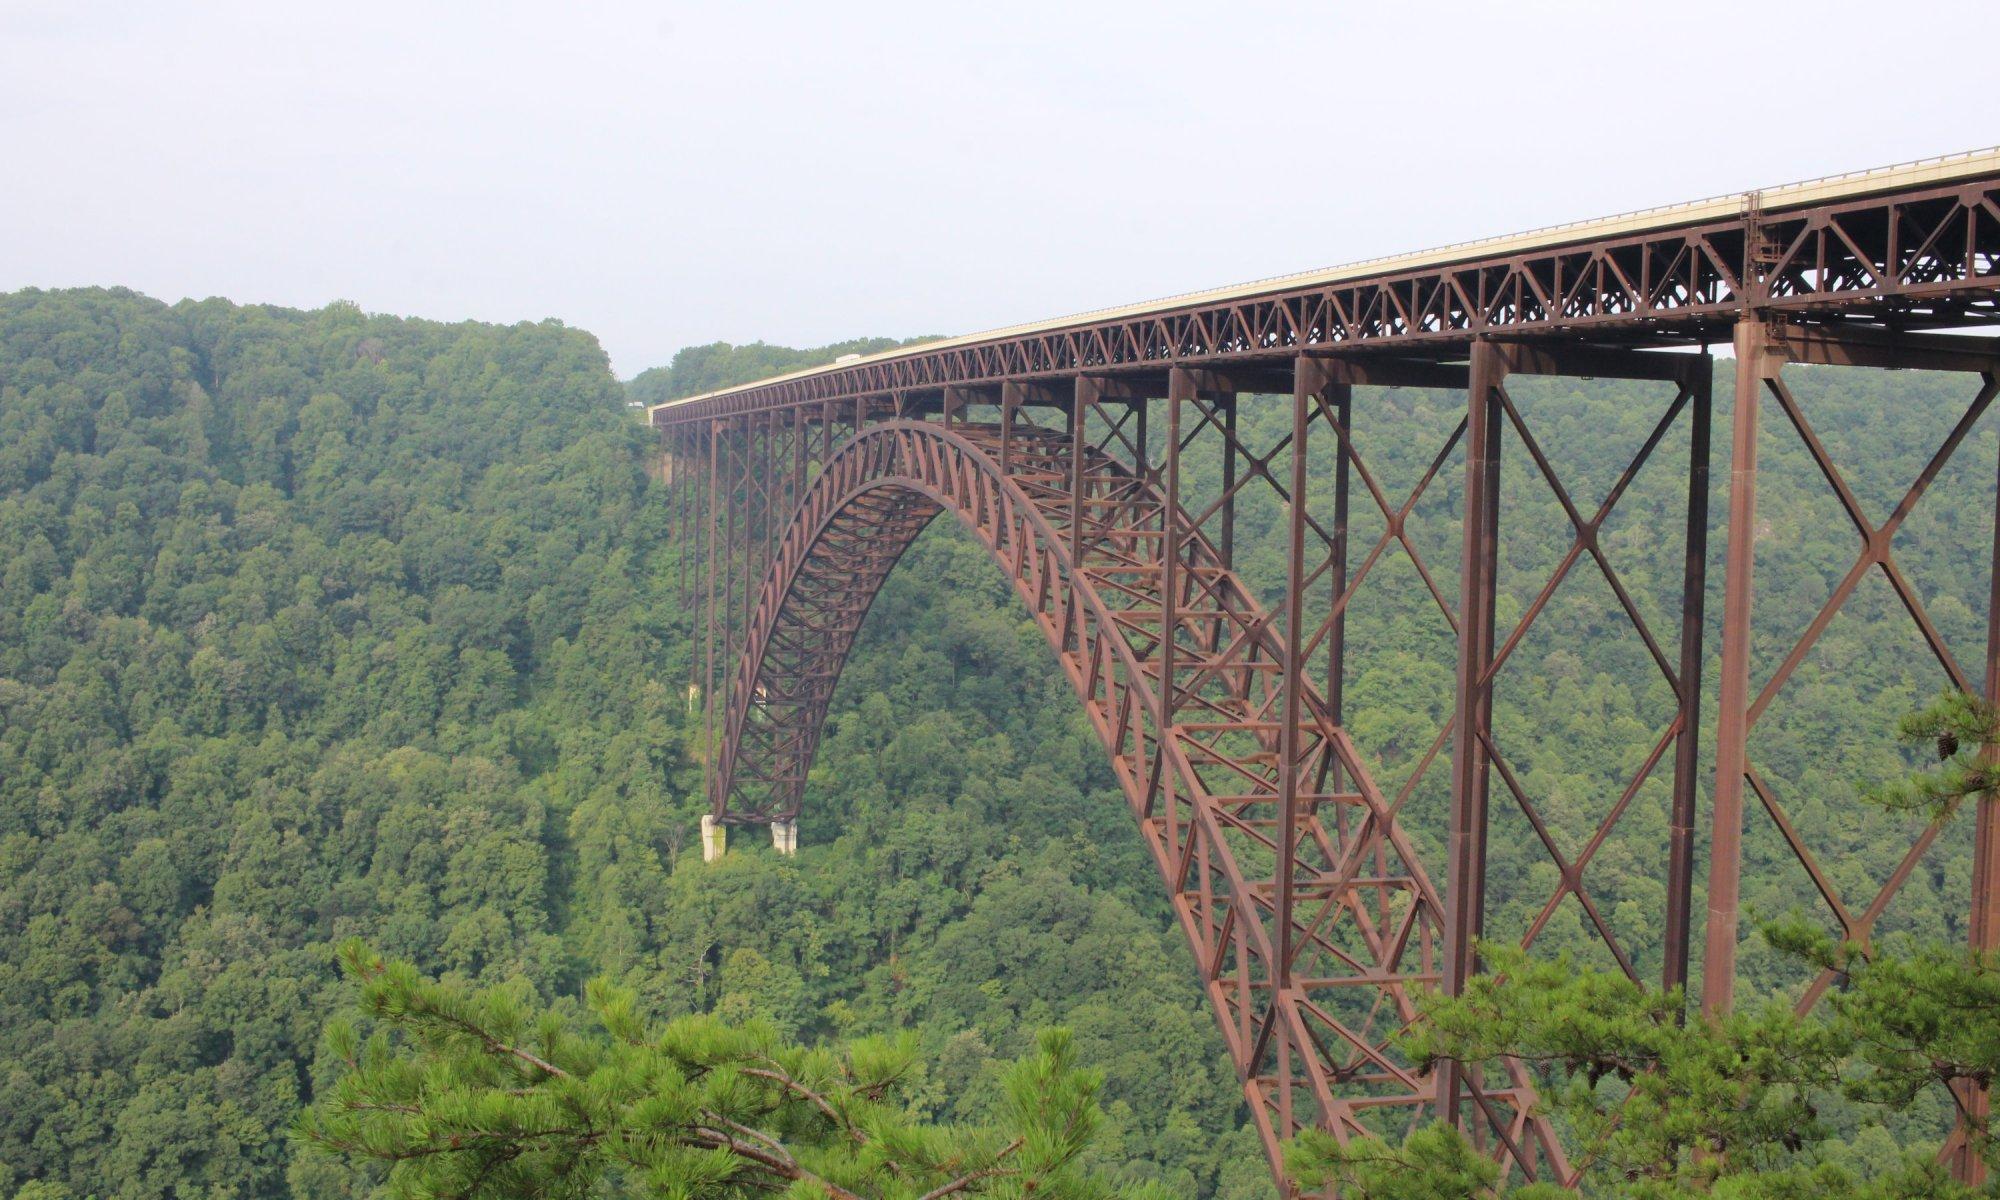 New River Gorge Bridge - 07-25-21